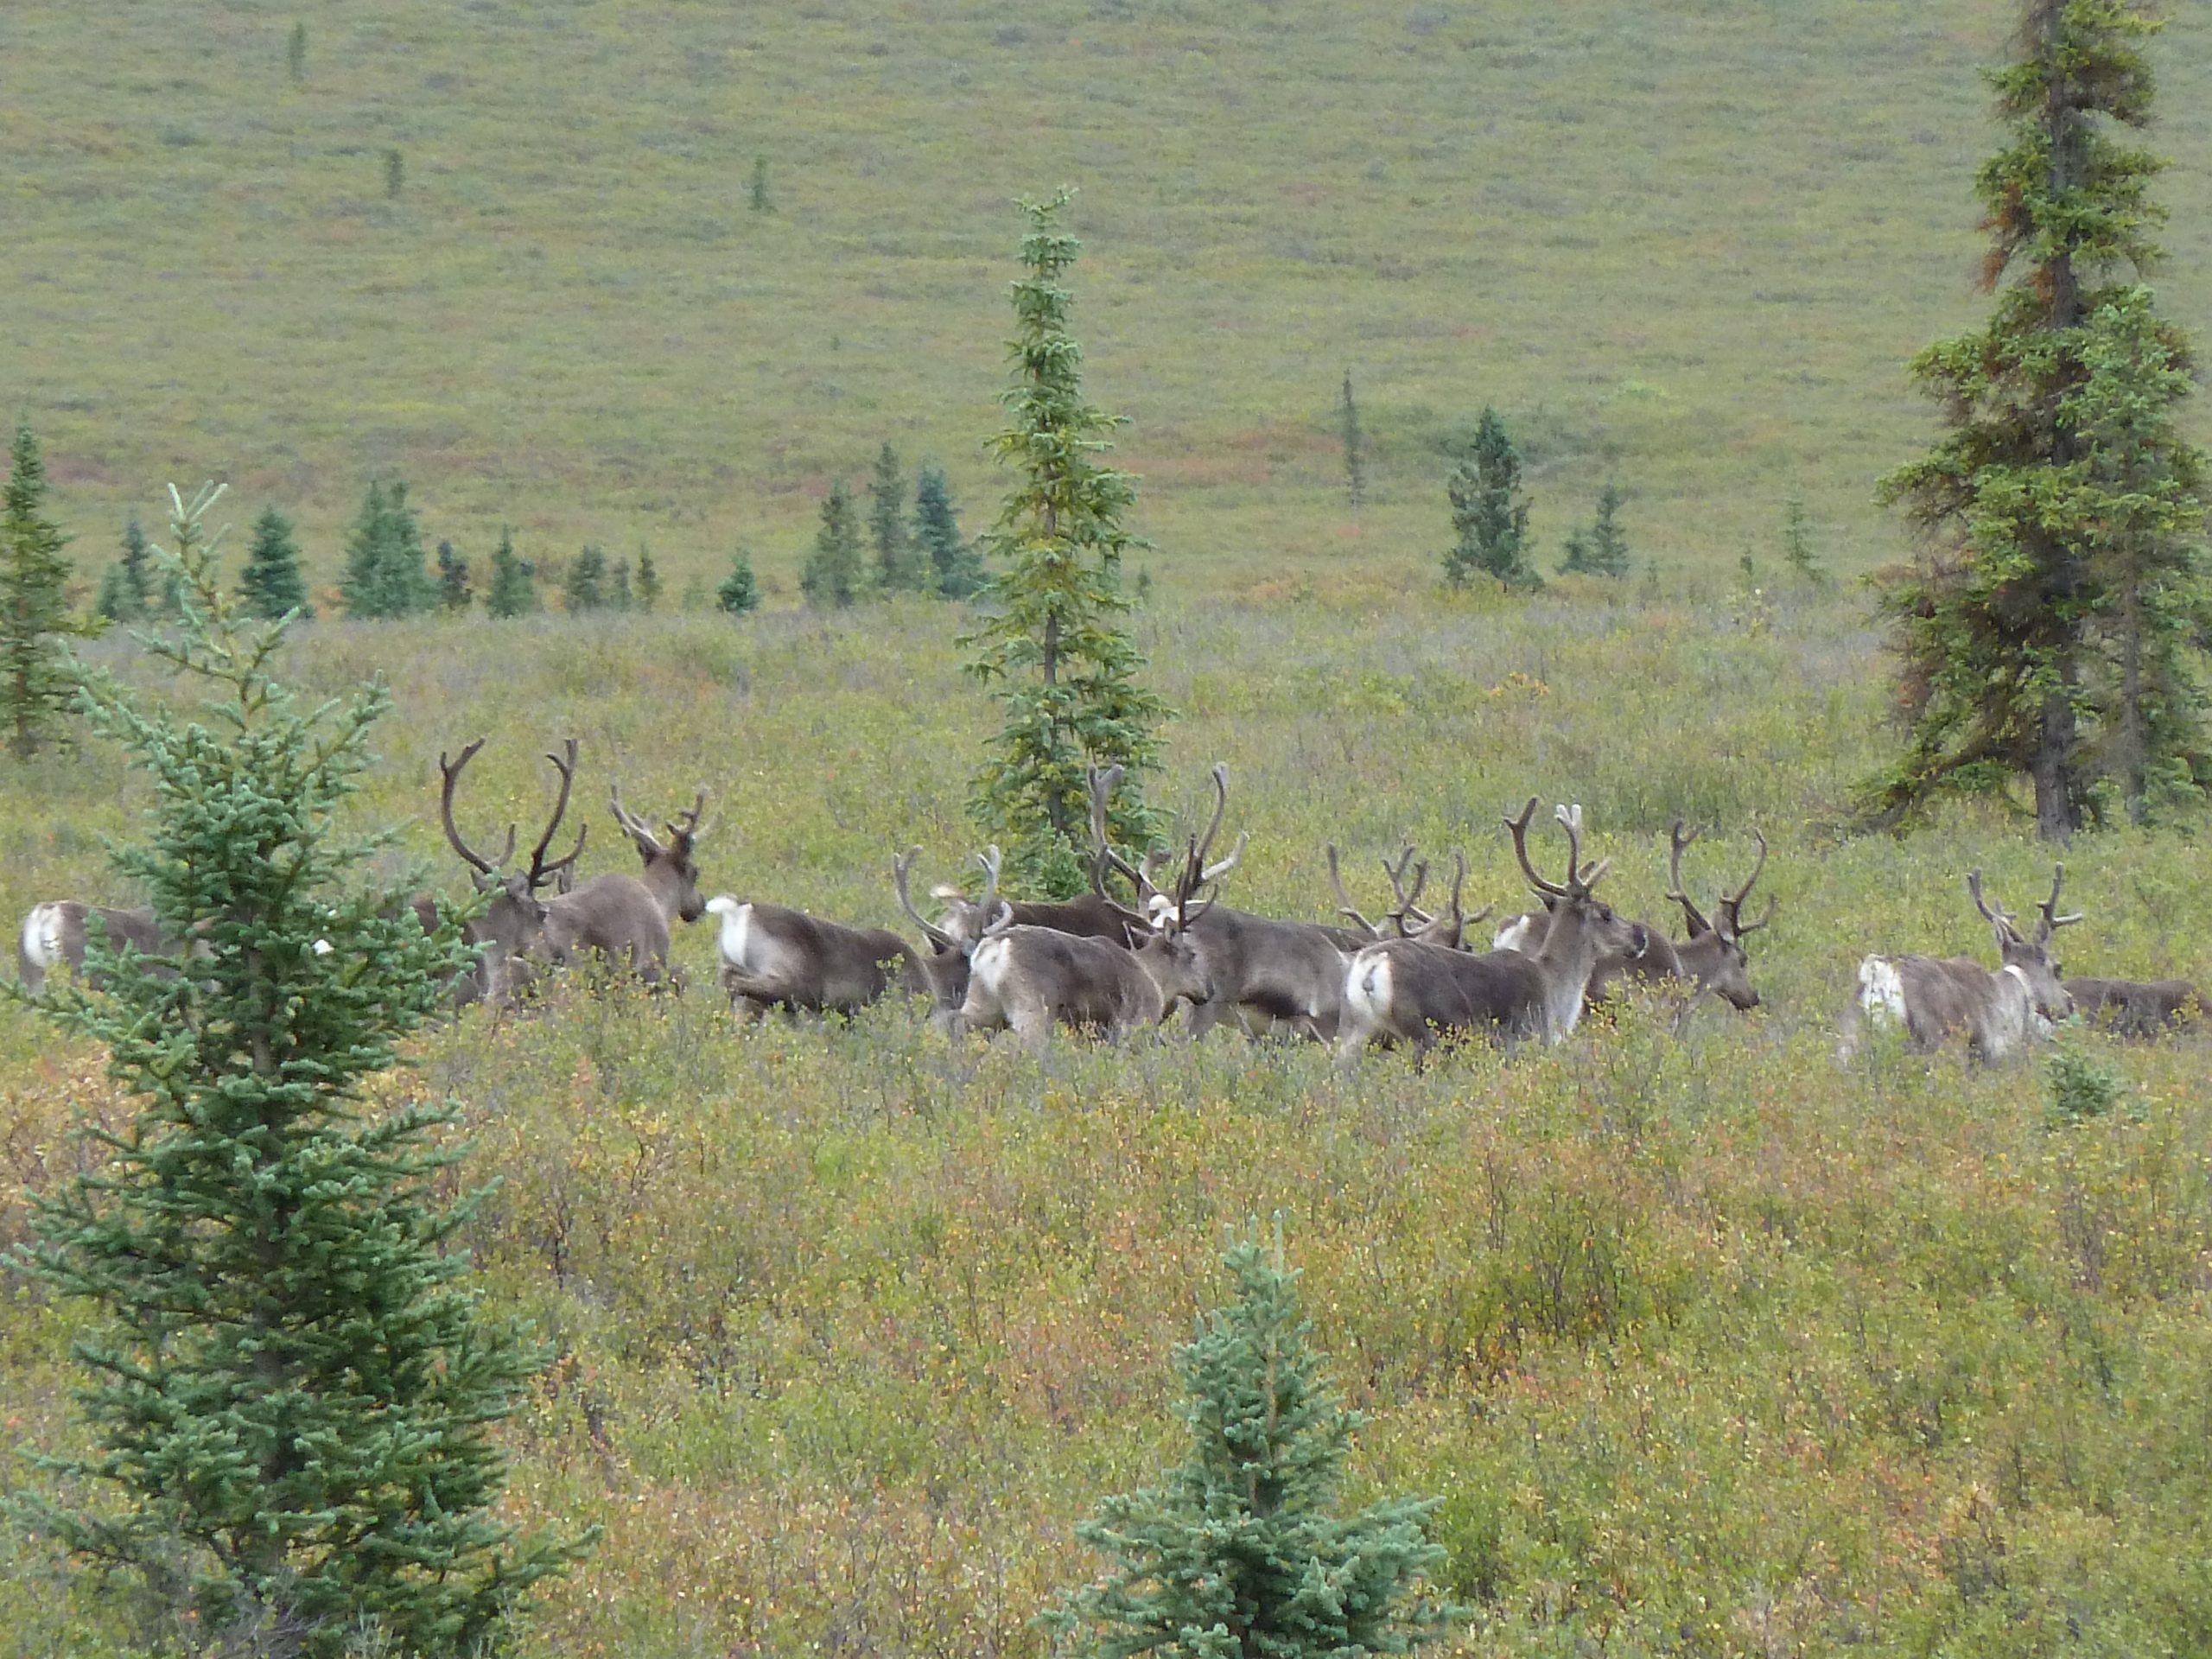 Radreise Alaska 2010 - Denali-NP - Karibu-Herde